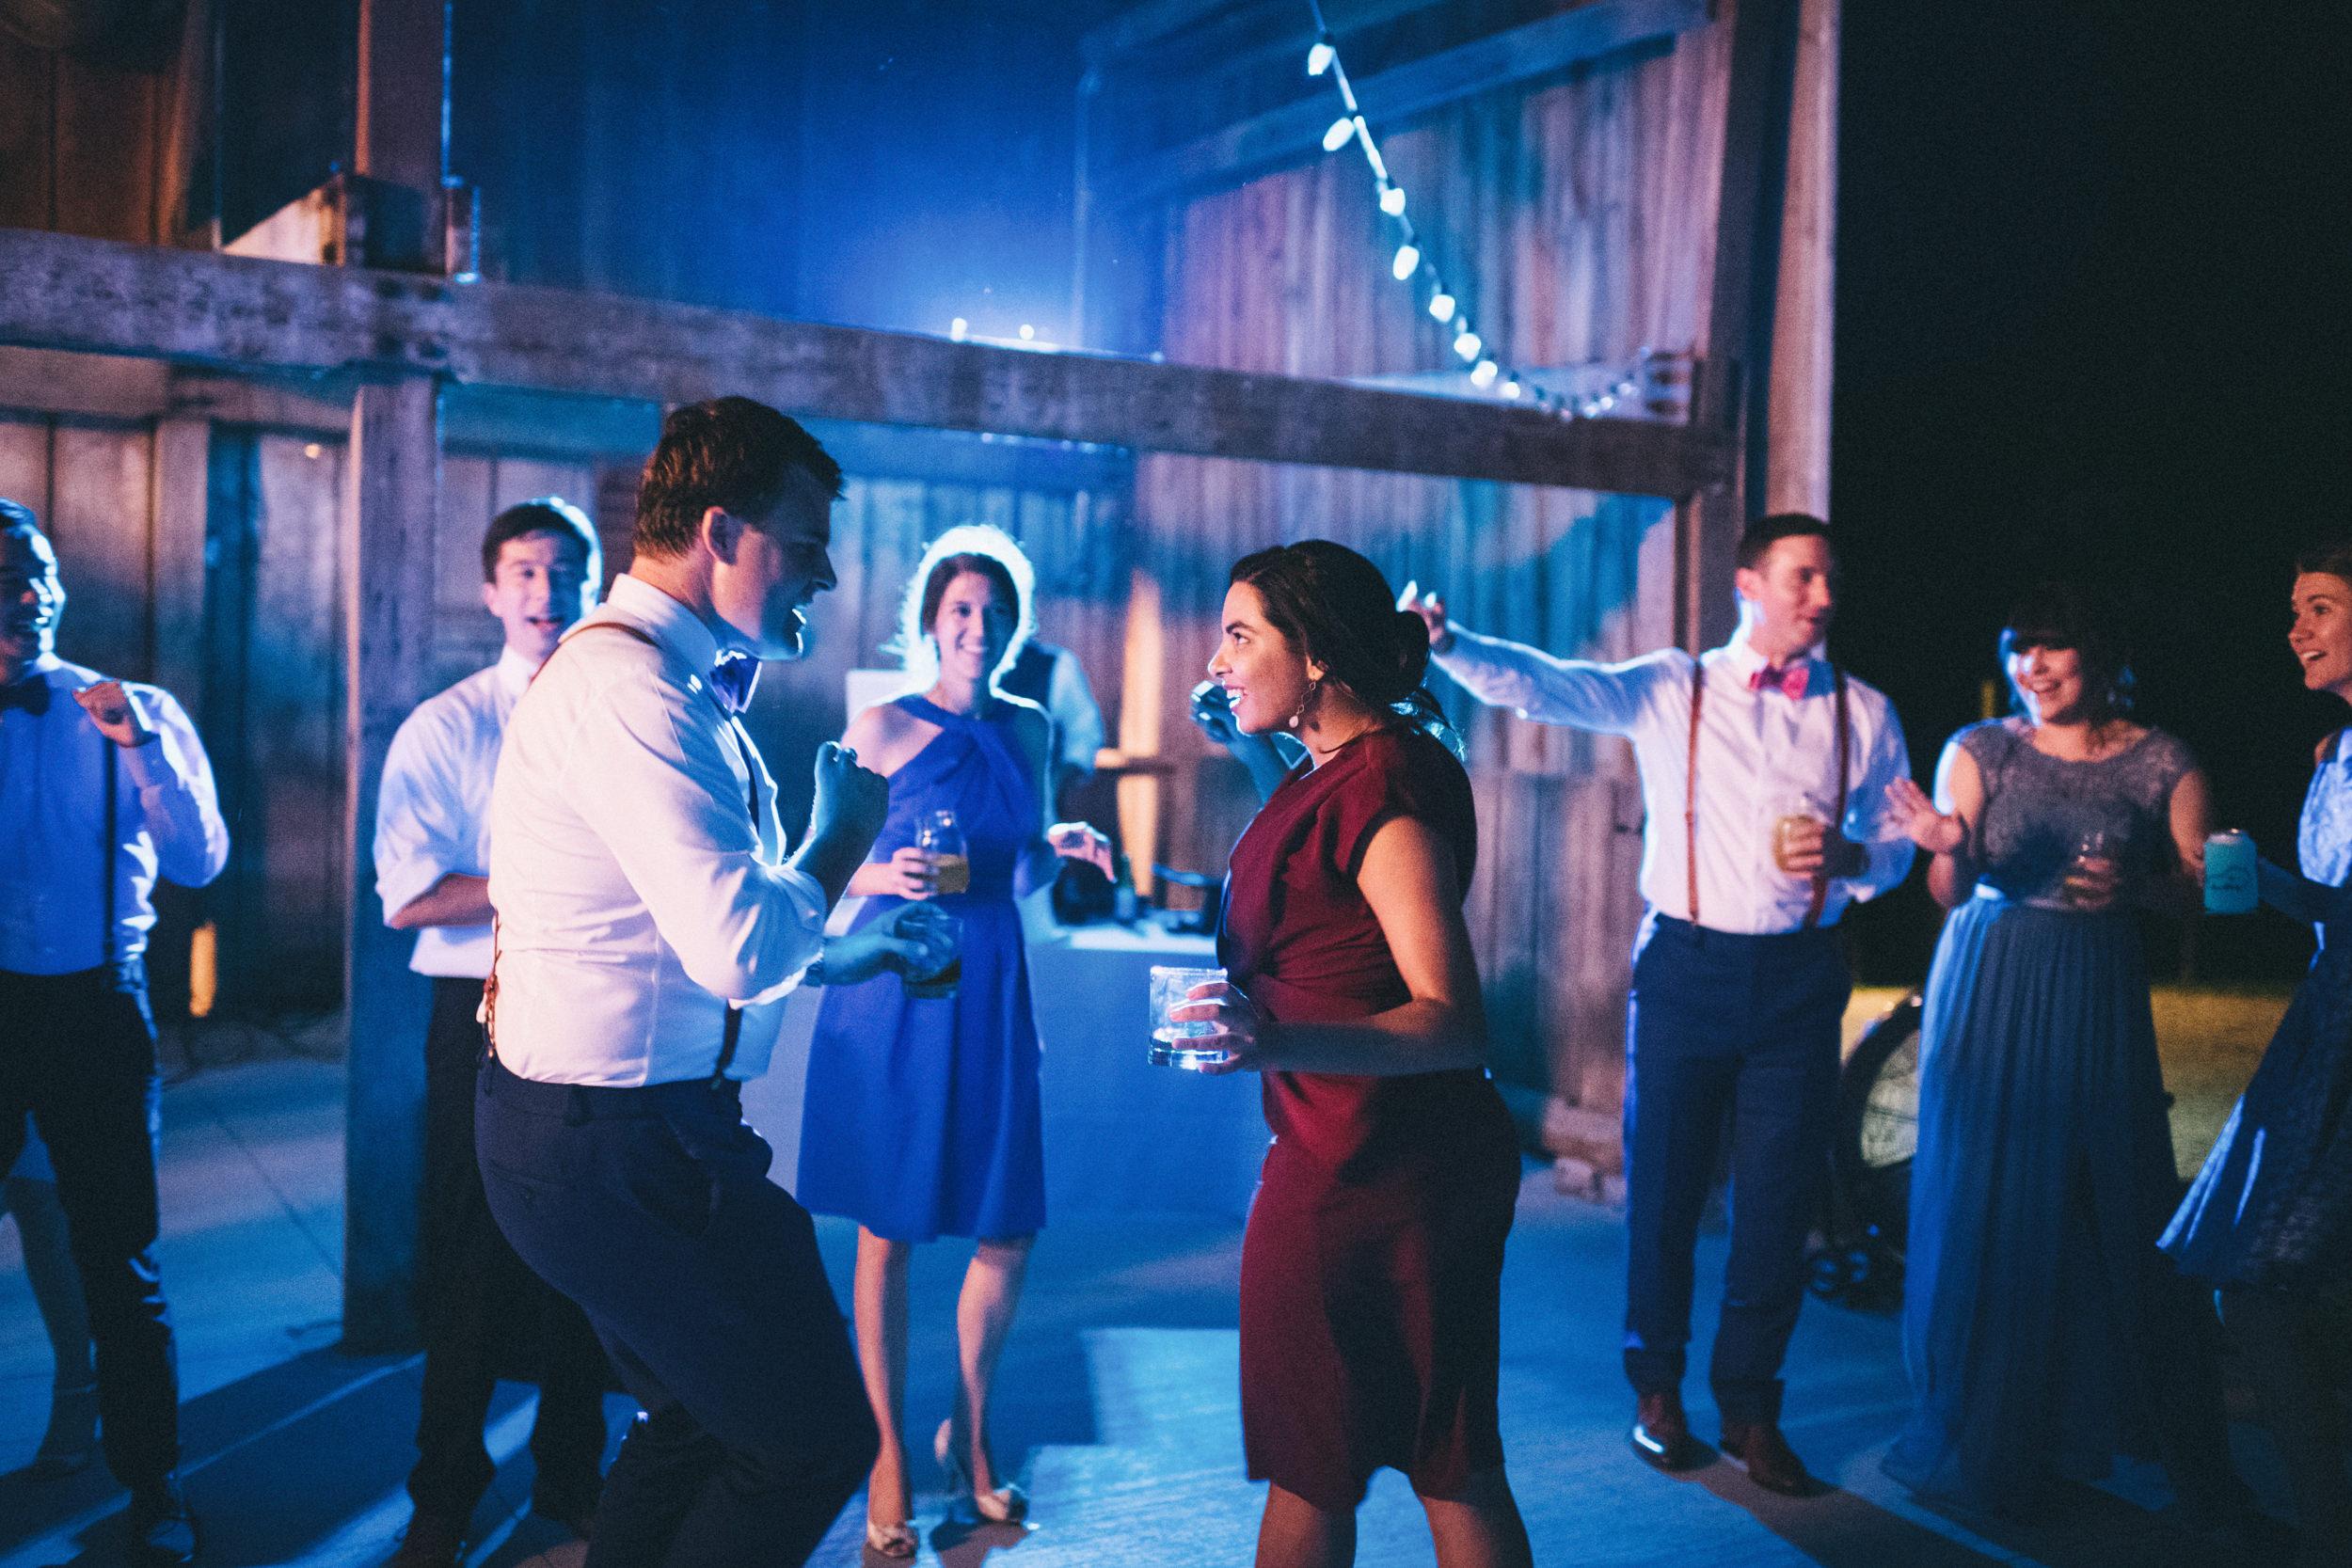 Louisville-Kentucky-Wedding-and-Elopement-Photographer-Sarah-Katherine-Davis-Photography-Summer-Jewel-Toned-Wedding-Chineese-Tea-Ceremony-Warrenwood-Manor-Danville-1027.jpg